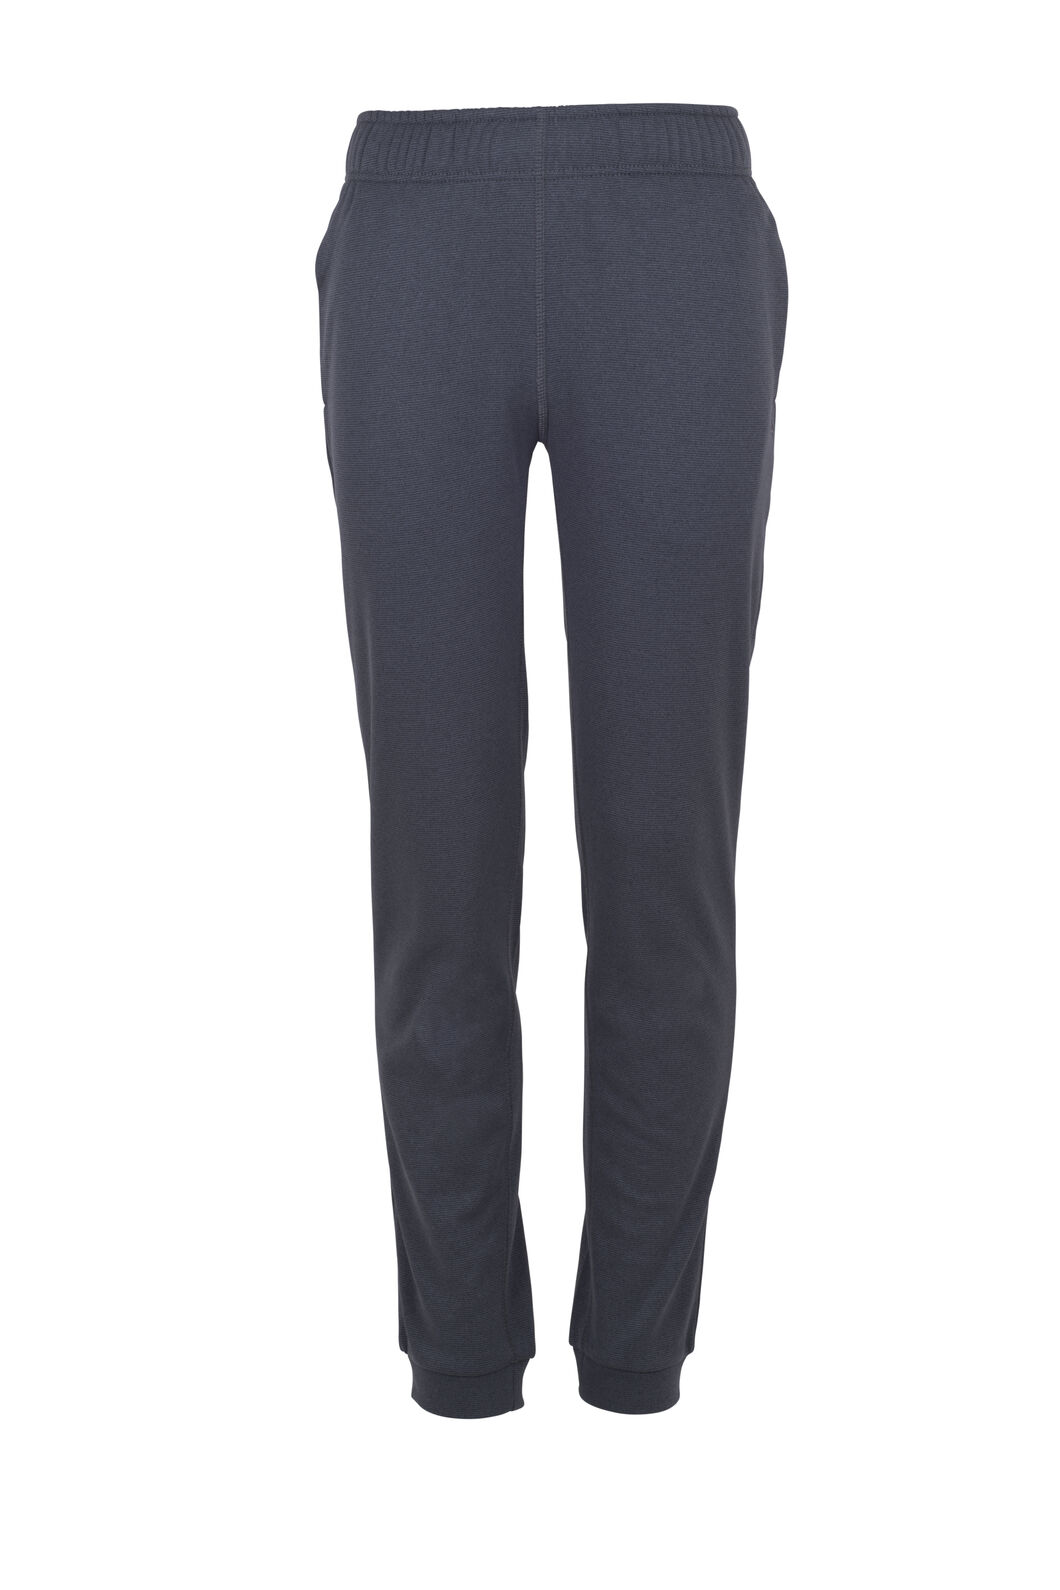 Macpac Training Fleece Pants — Kids', Asphalt, hi-res